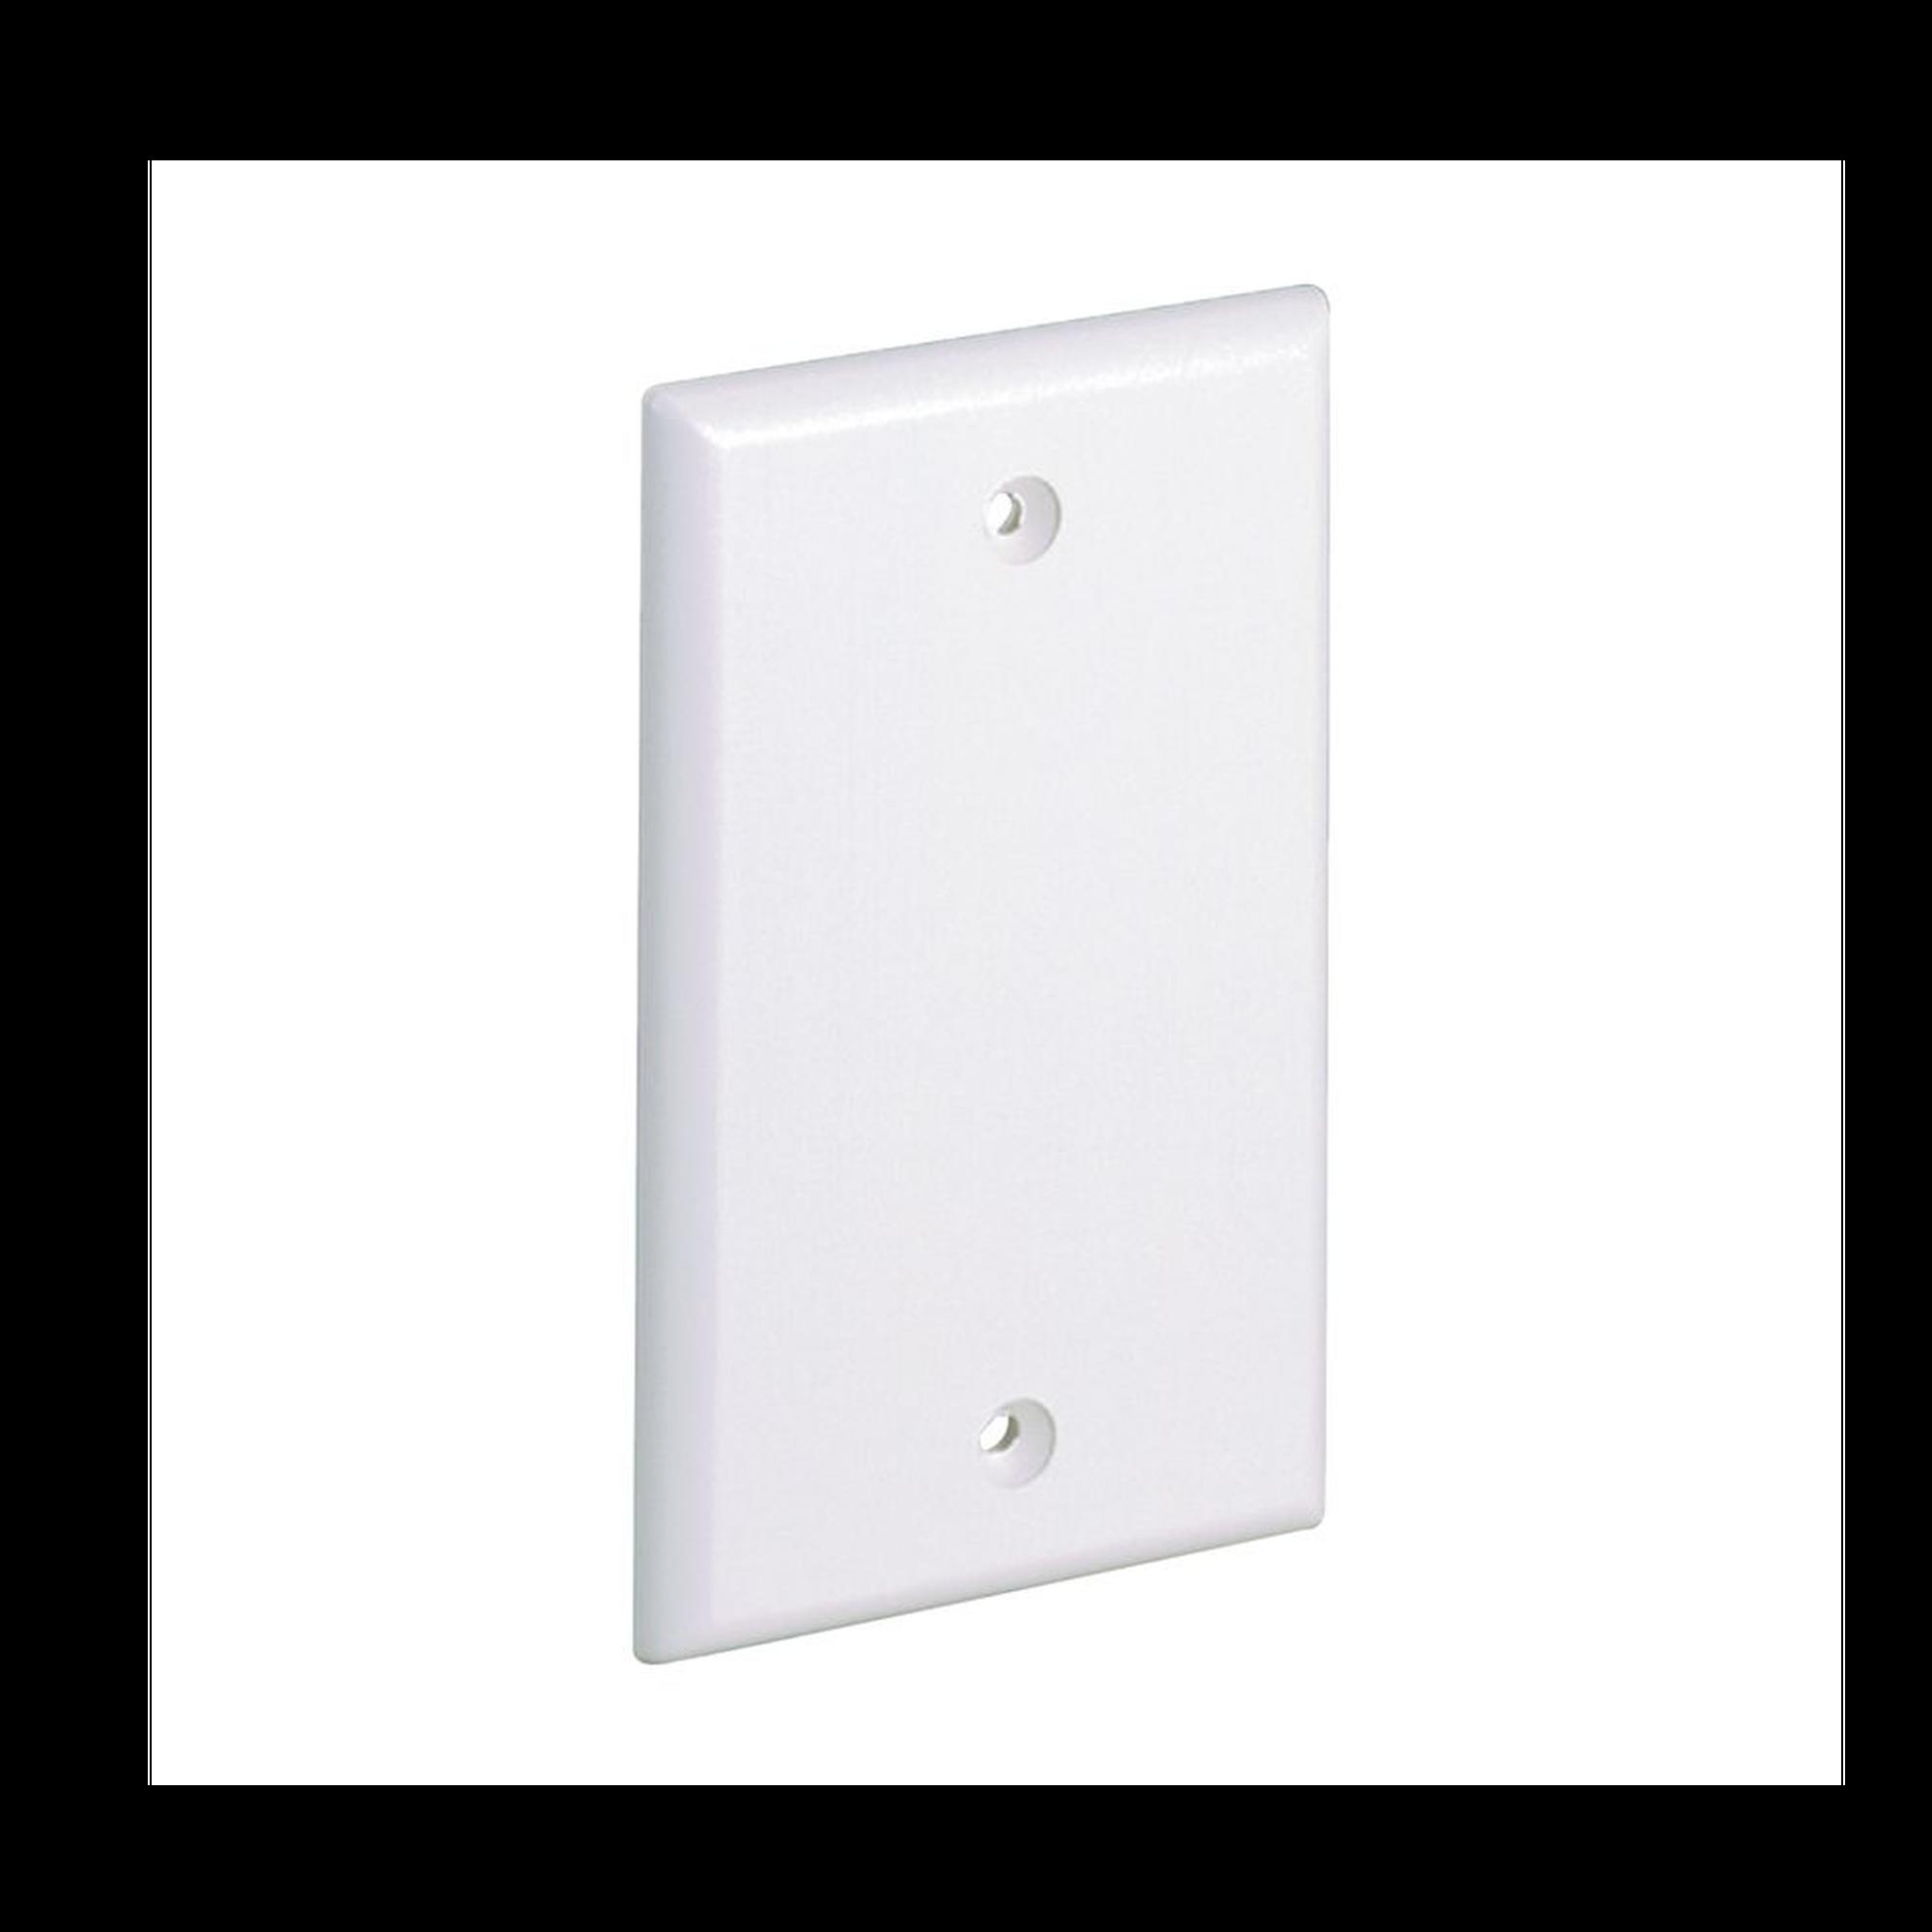 Placa de Pared Ciega Universal, Material ABS, Color Blanco Mate